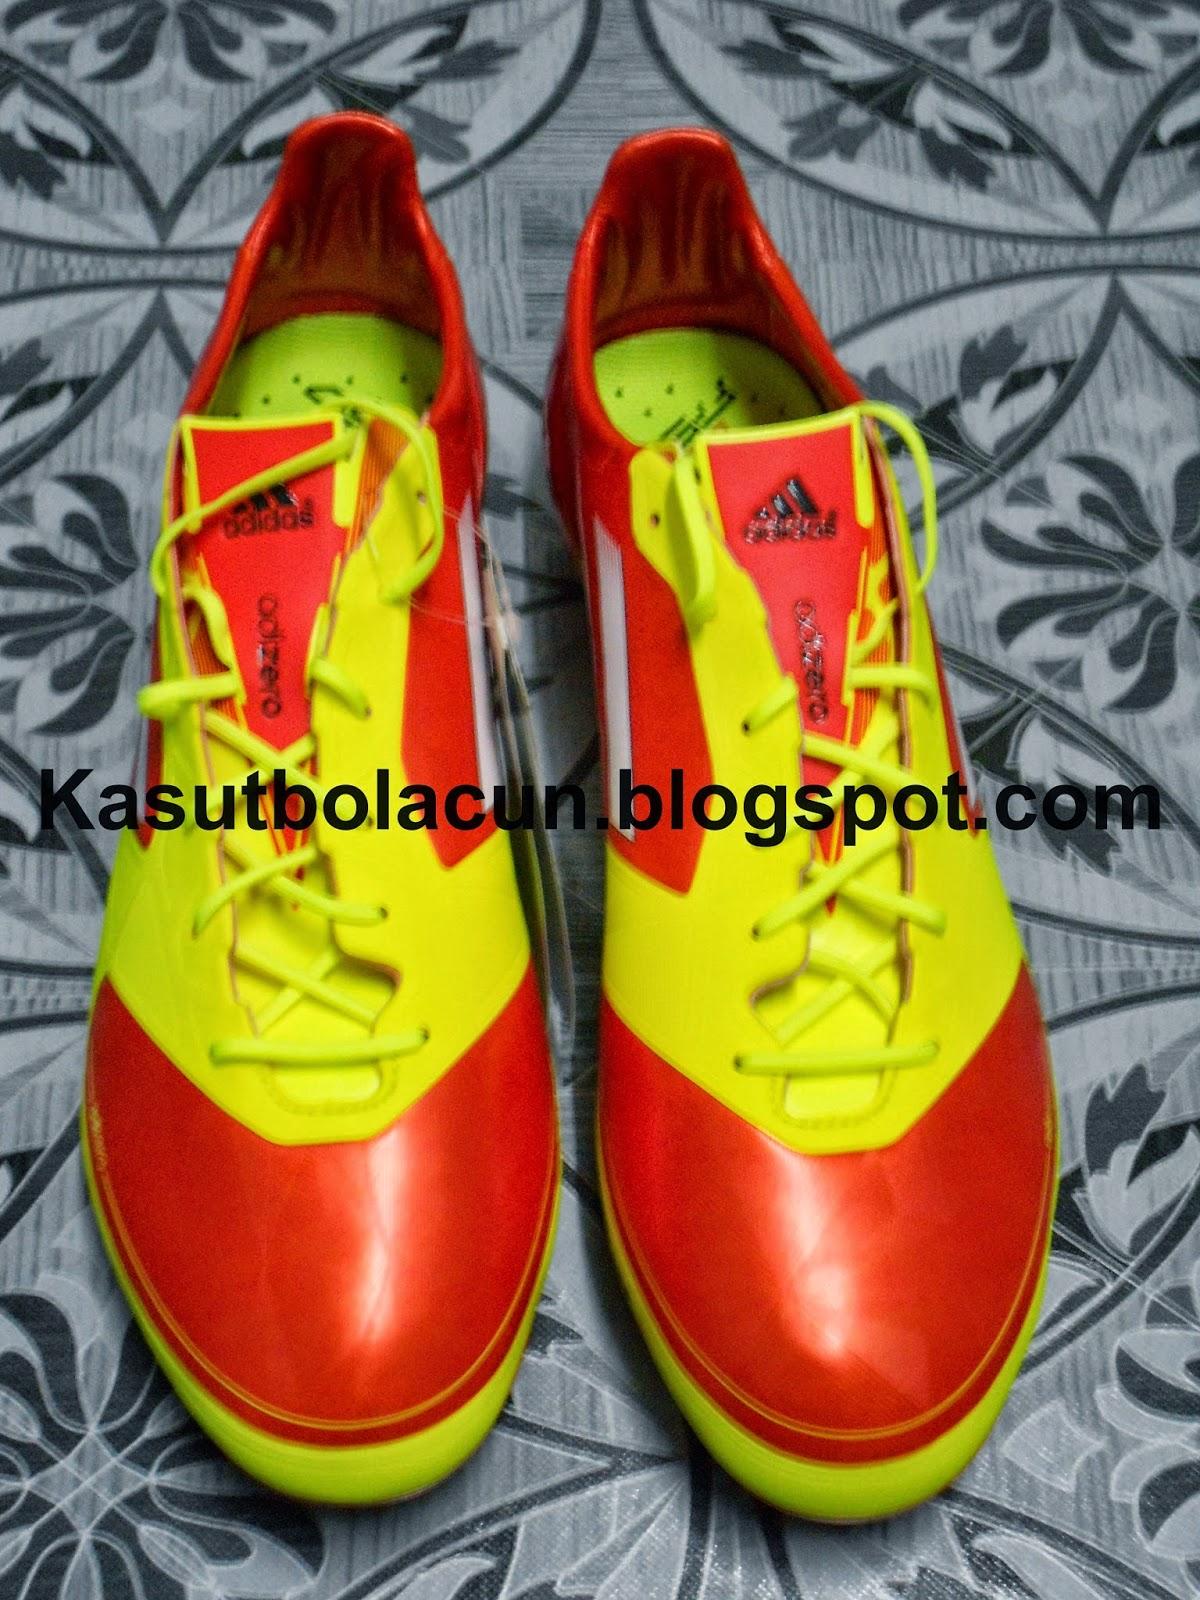 http://kasutbolacun.blogspot.com/2014/12/adidas-f50-adizero-micoach-1-fg-merah_18.html